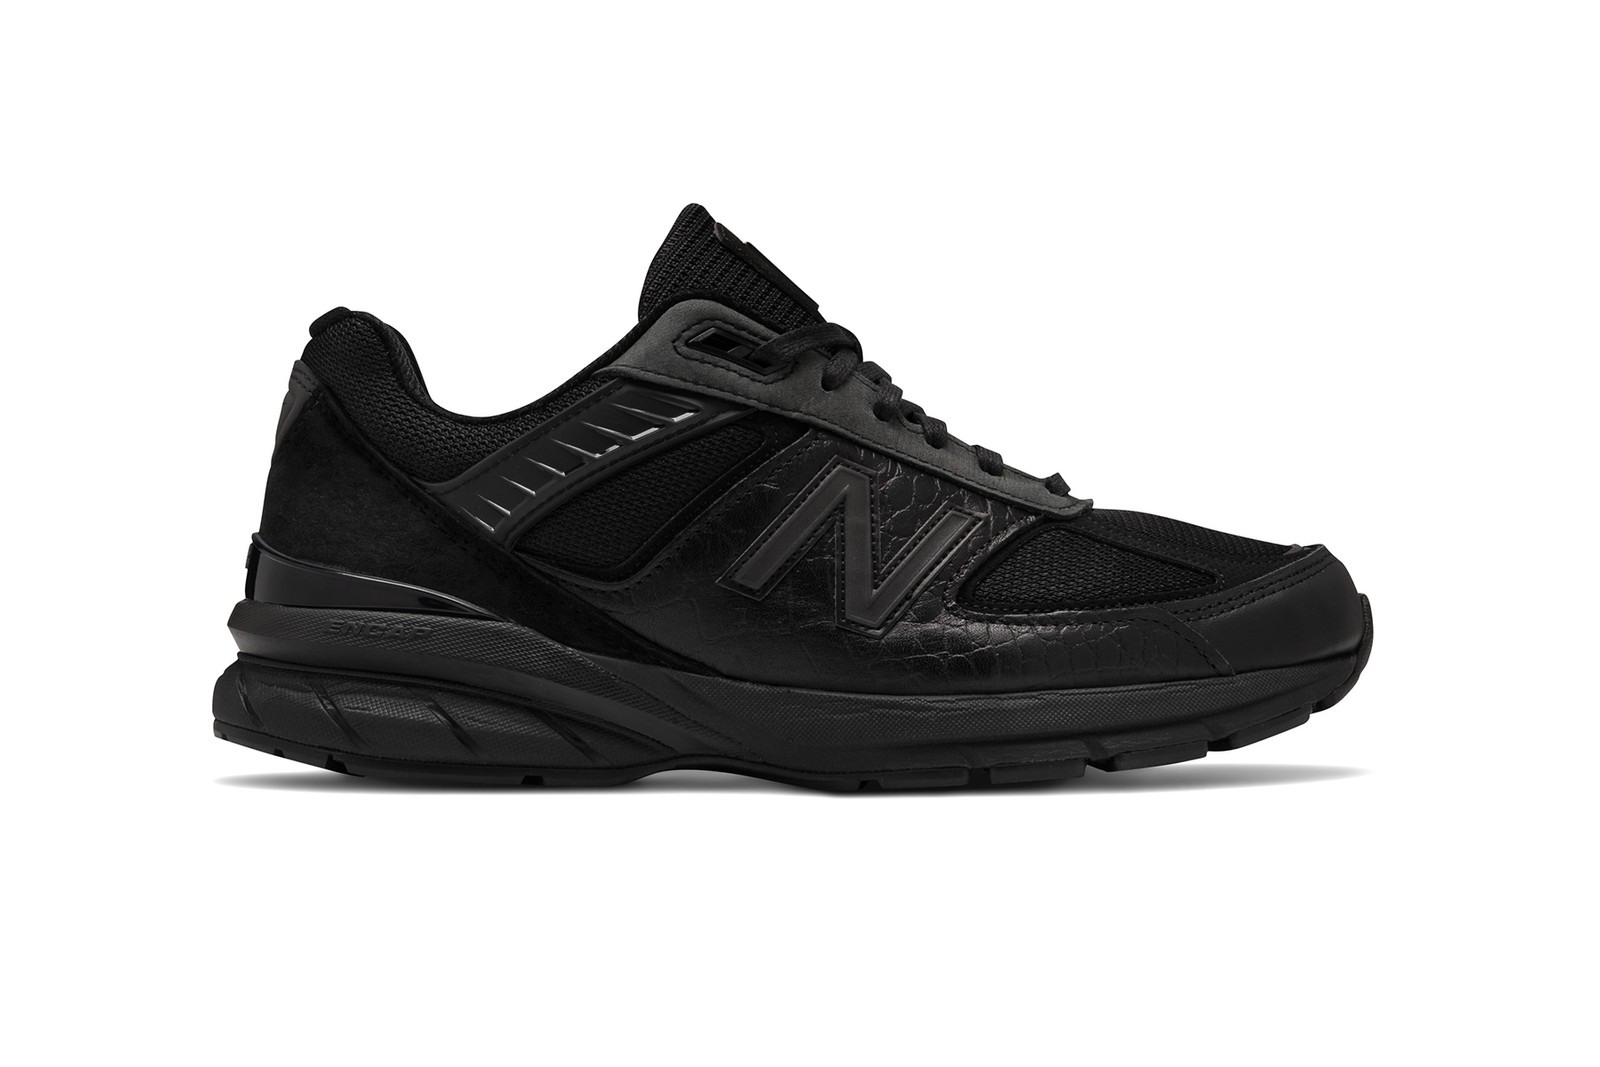 New Balance ニューバランス エンジニアド ガーメンツ Engineered Garments 左右非対称 デザイン コラボ 990v5 発売